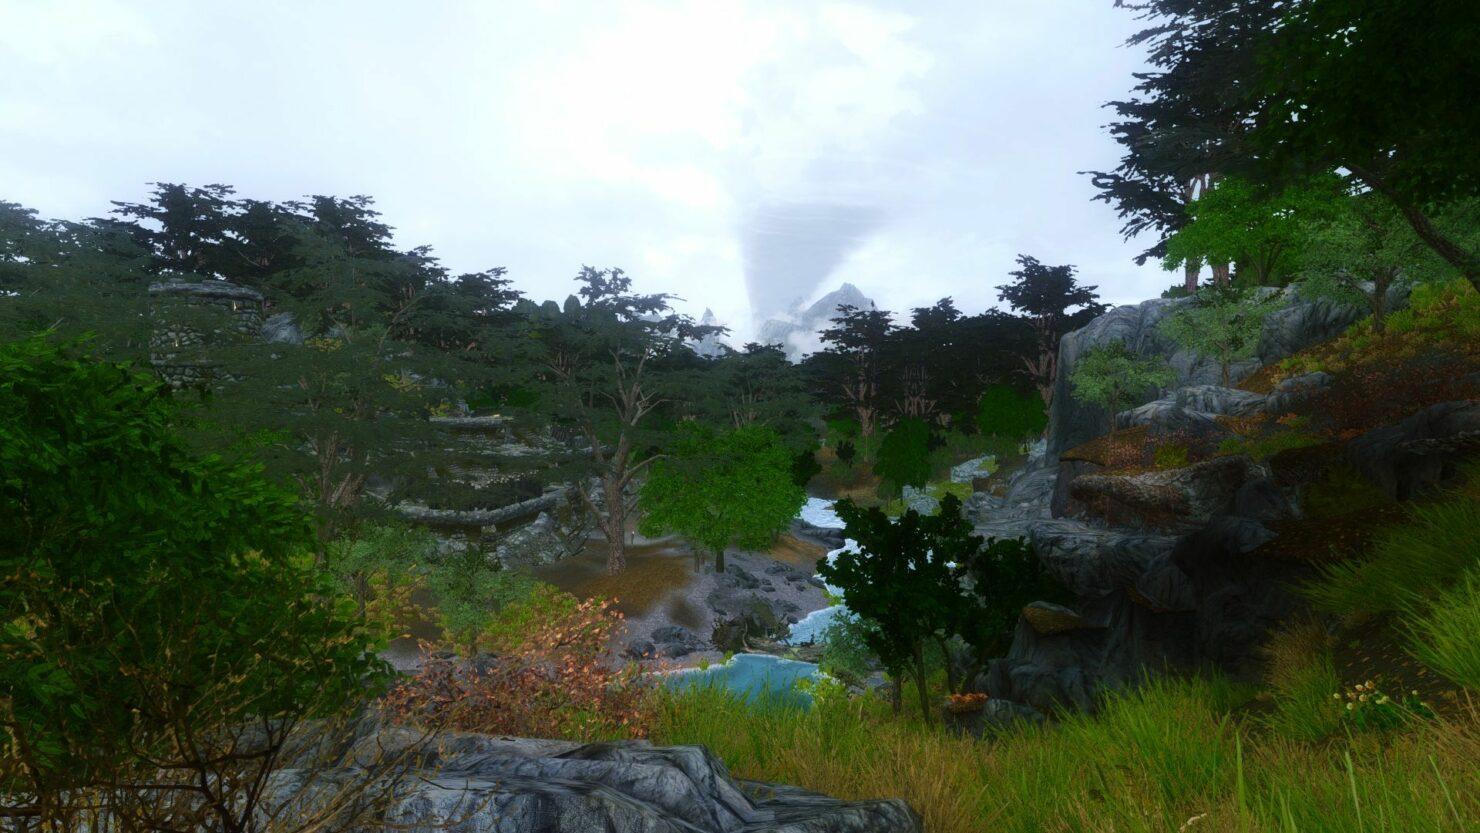 elder-scrolls-v-skyrim-legendary-edition-project-rainforest-mod-update-2